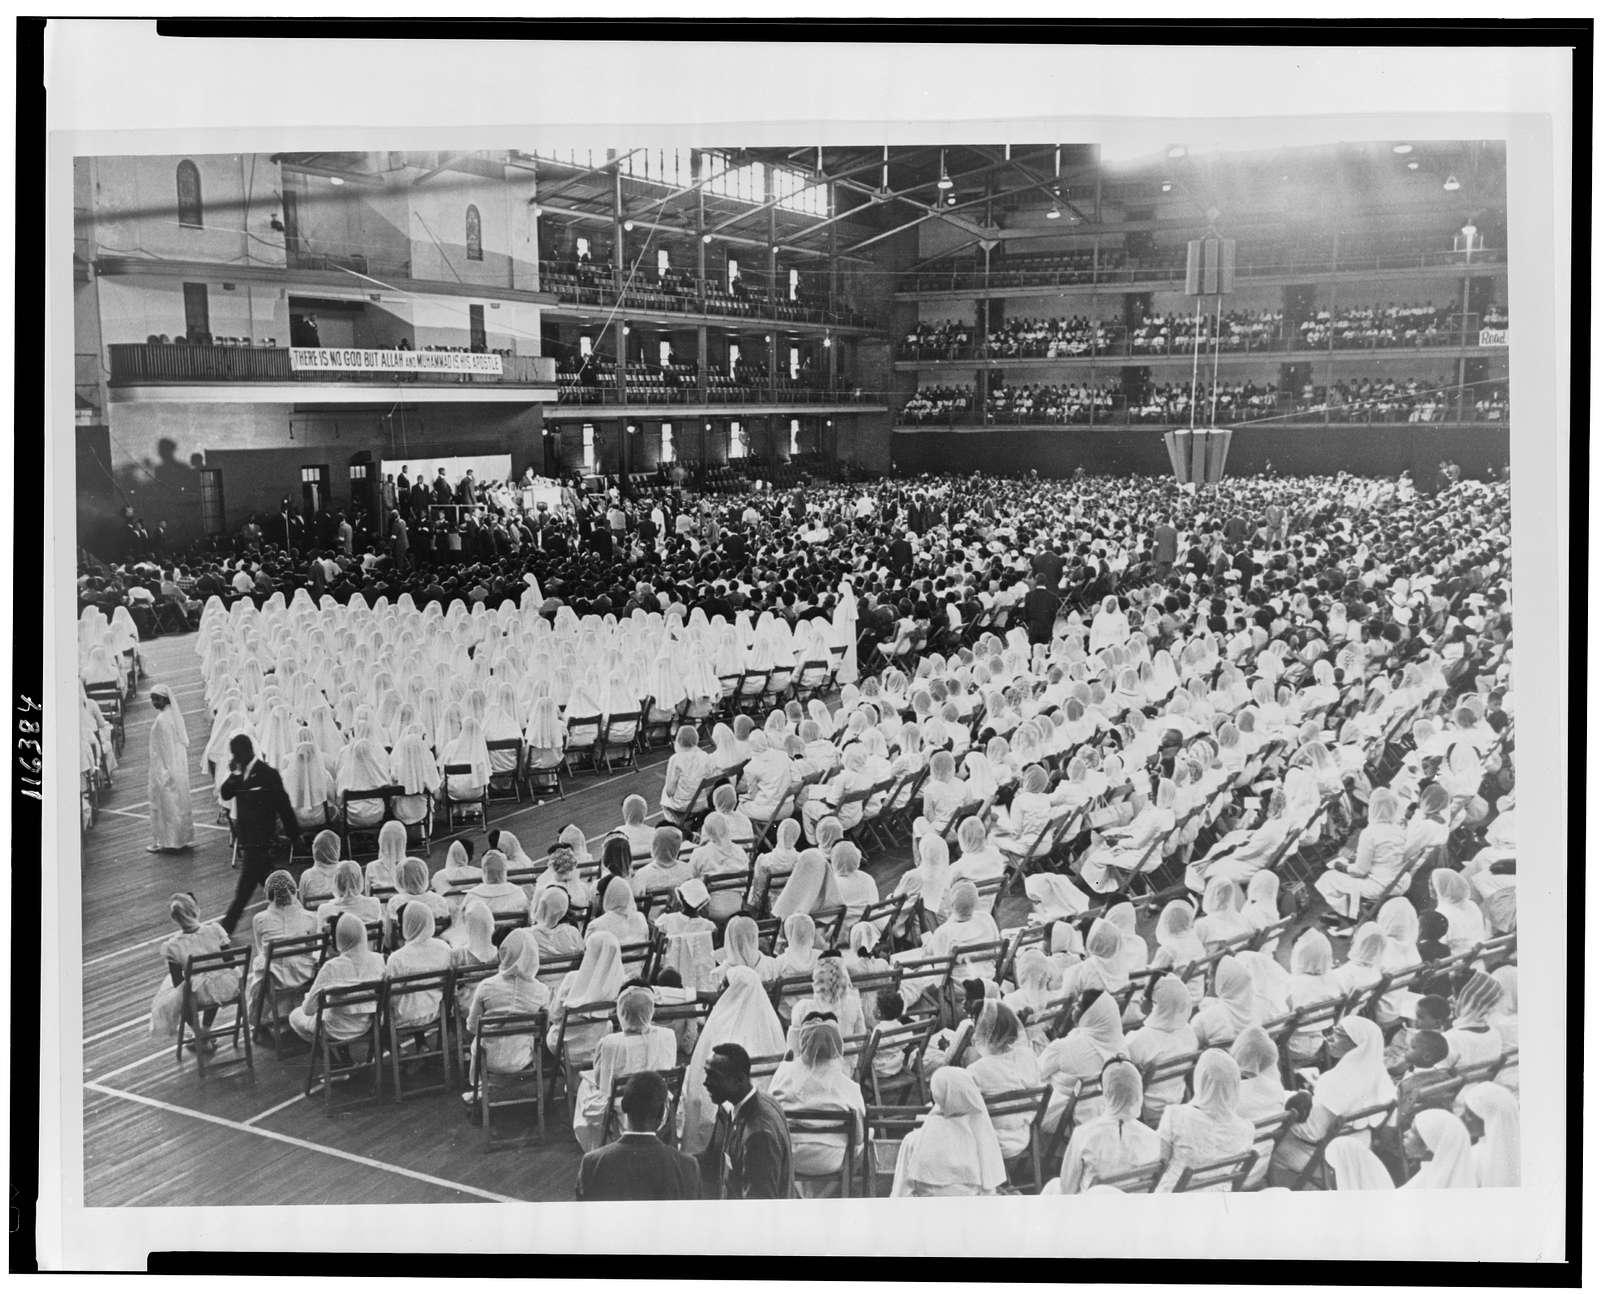 [Elijah Muhammad addressing an assembly of Muslim followers] / World Telegram & Sun photo by Stanley Wolfson.